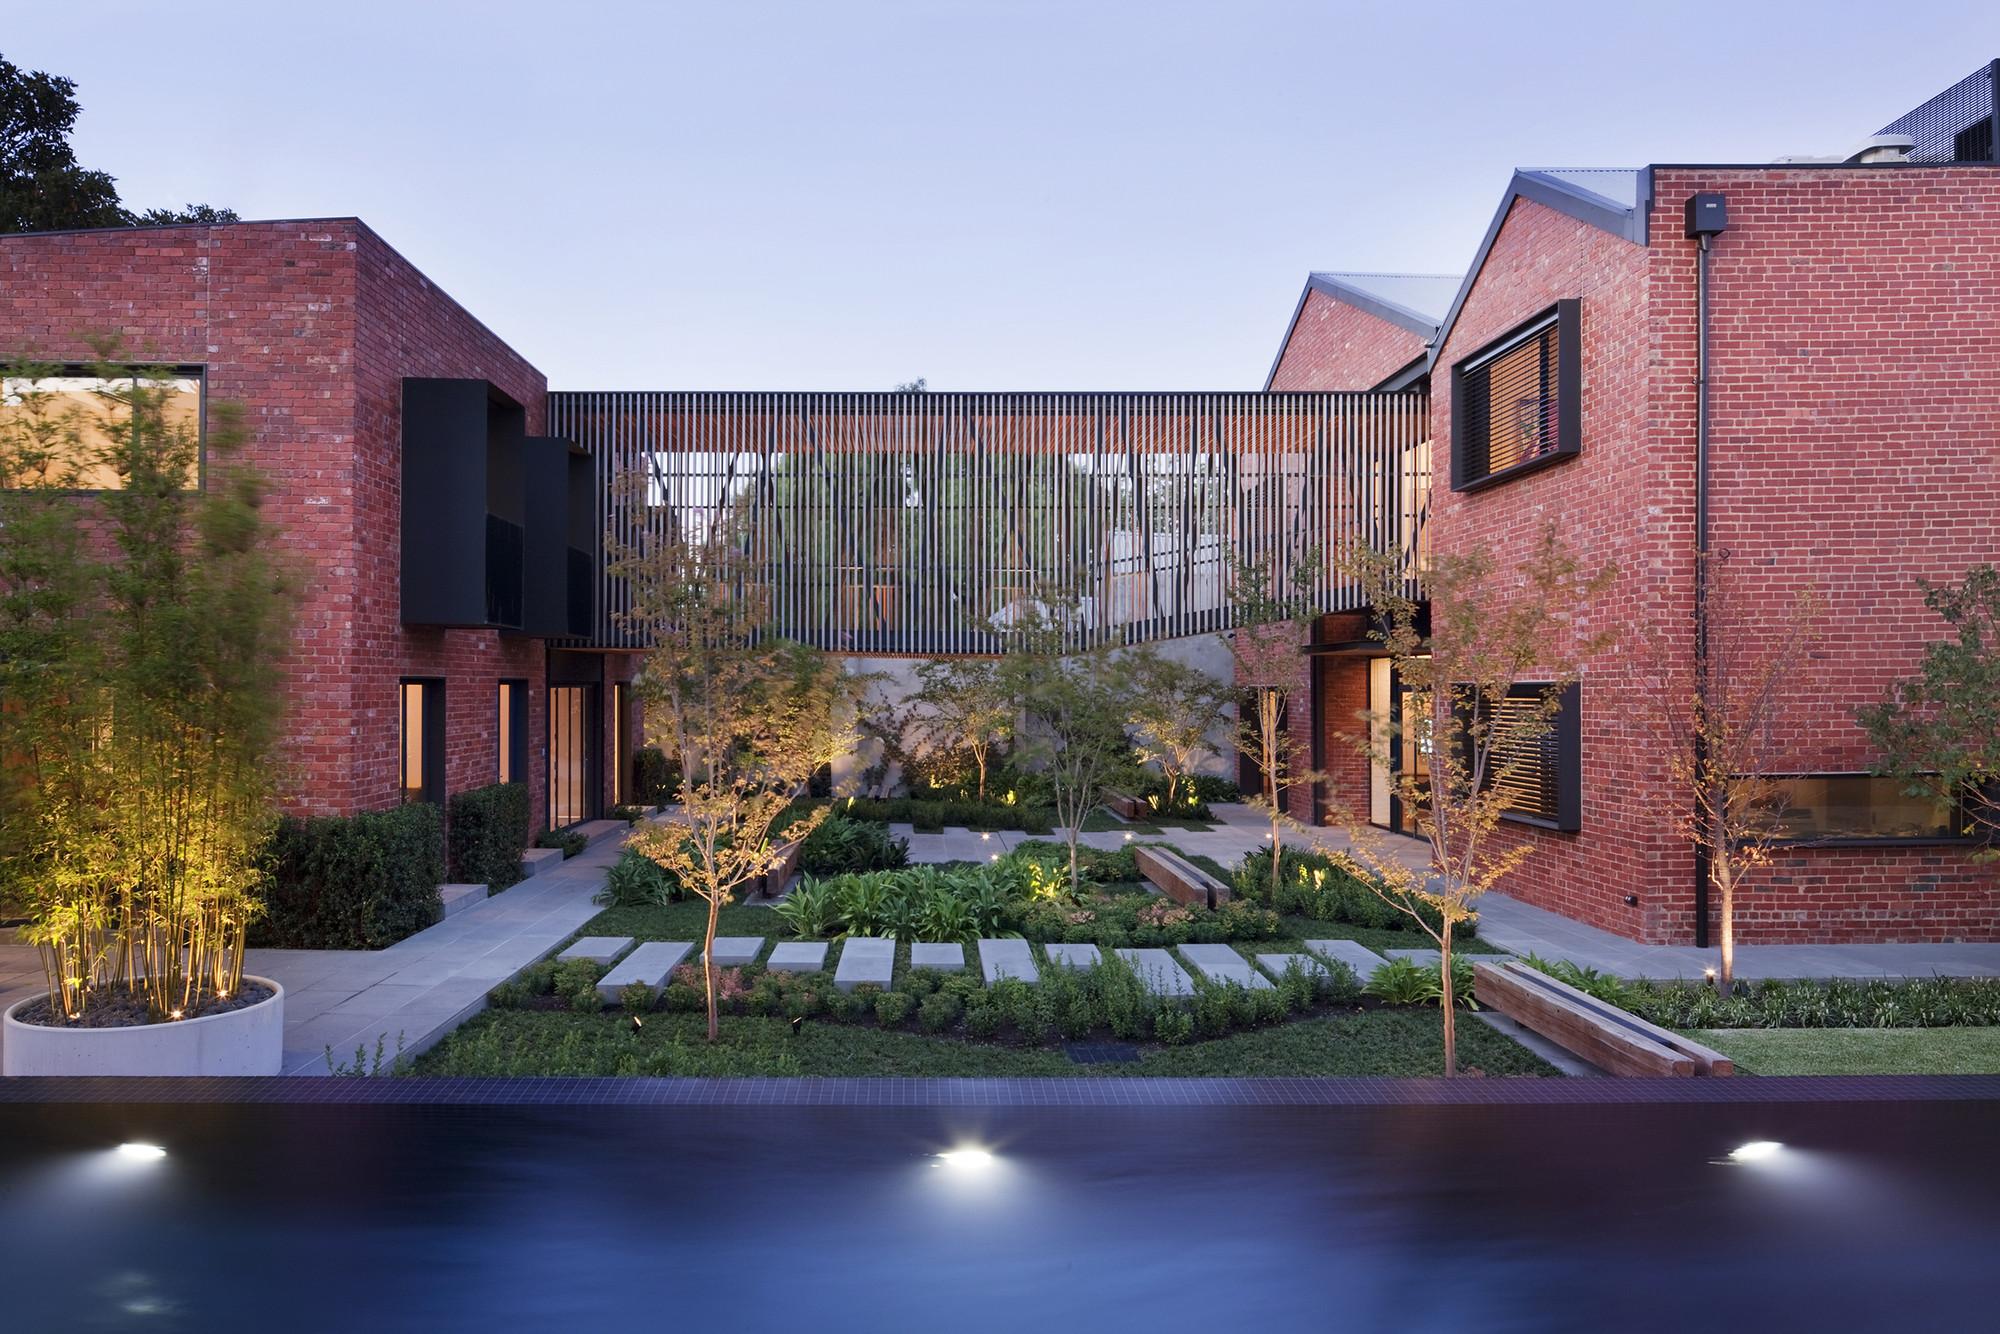 Golden Crust Bakery / Jackson Clements Burrows Architects, © Shannon McGrath